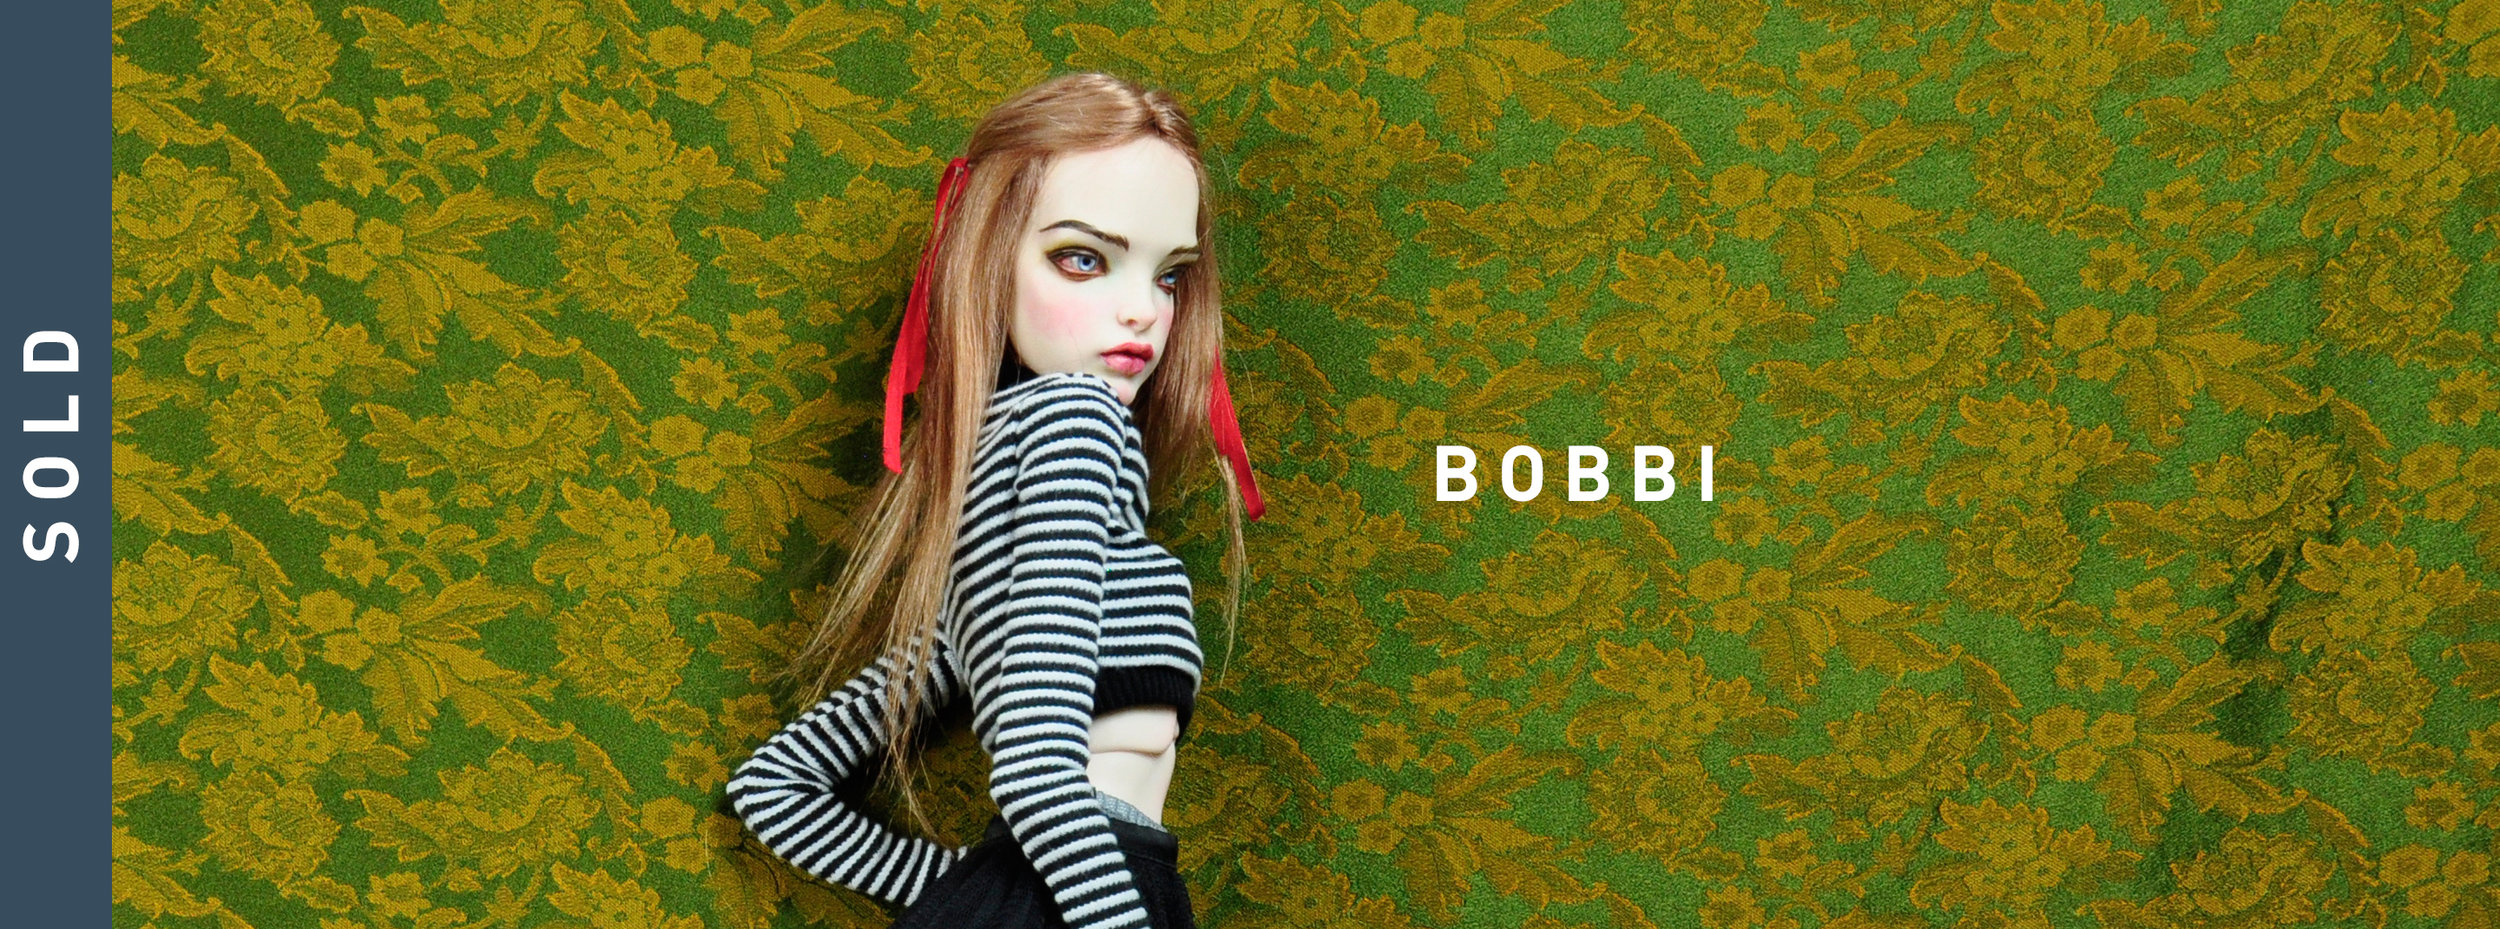 BobbiGallery2.jpg